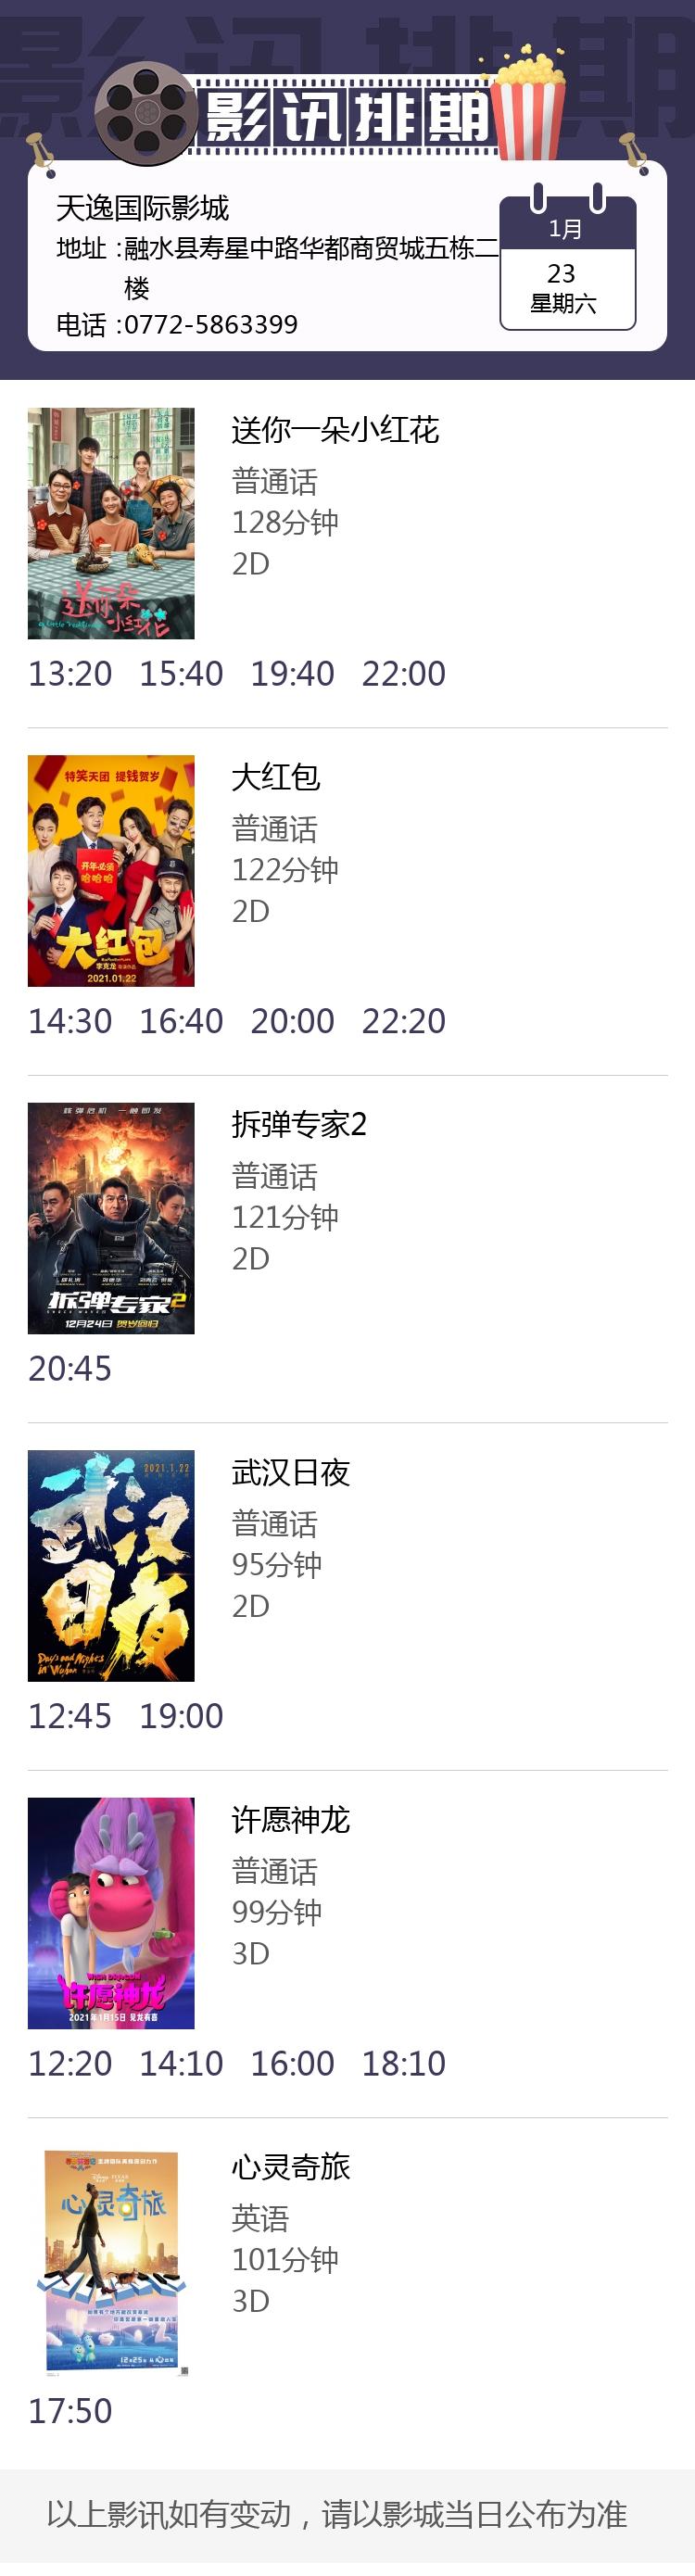 158_movie_express_20210123_1611320327.jpg